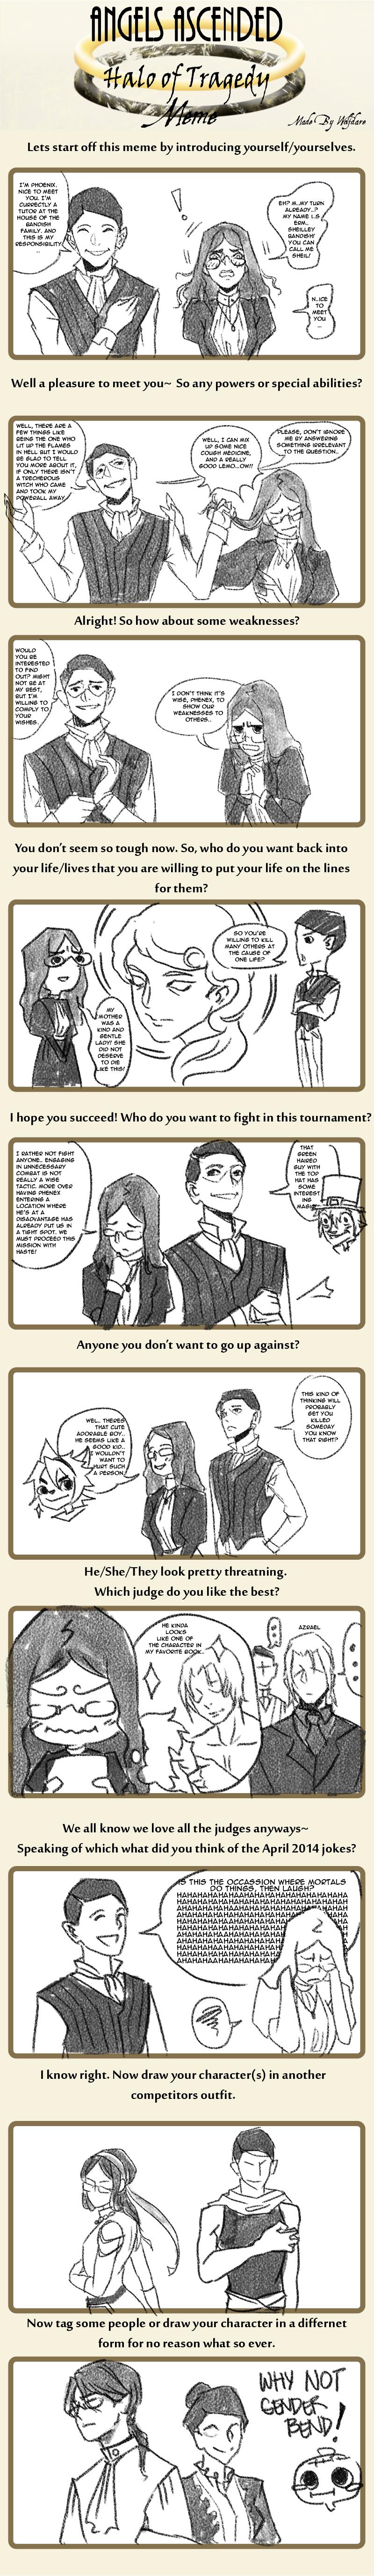 AAOCT: The meme by leefaan